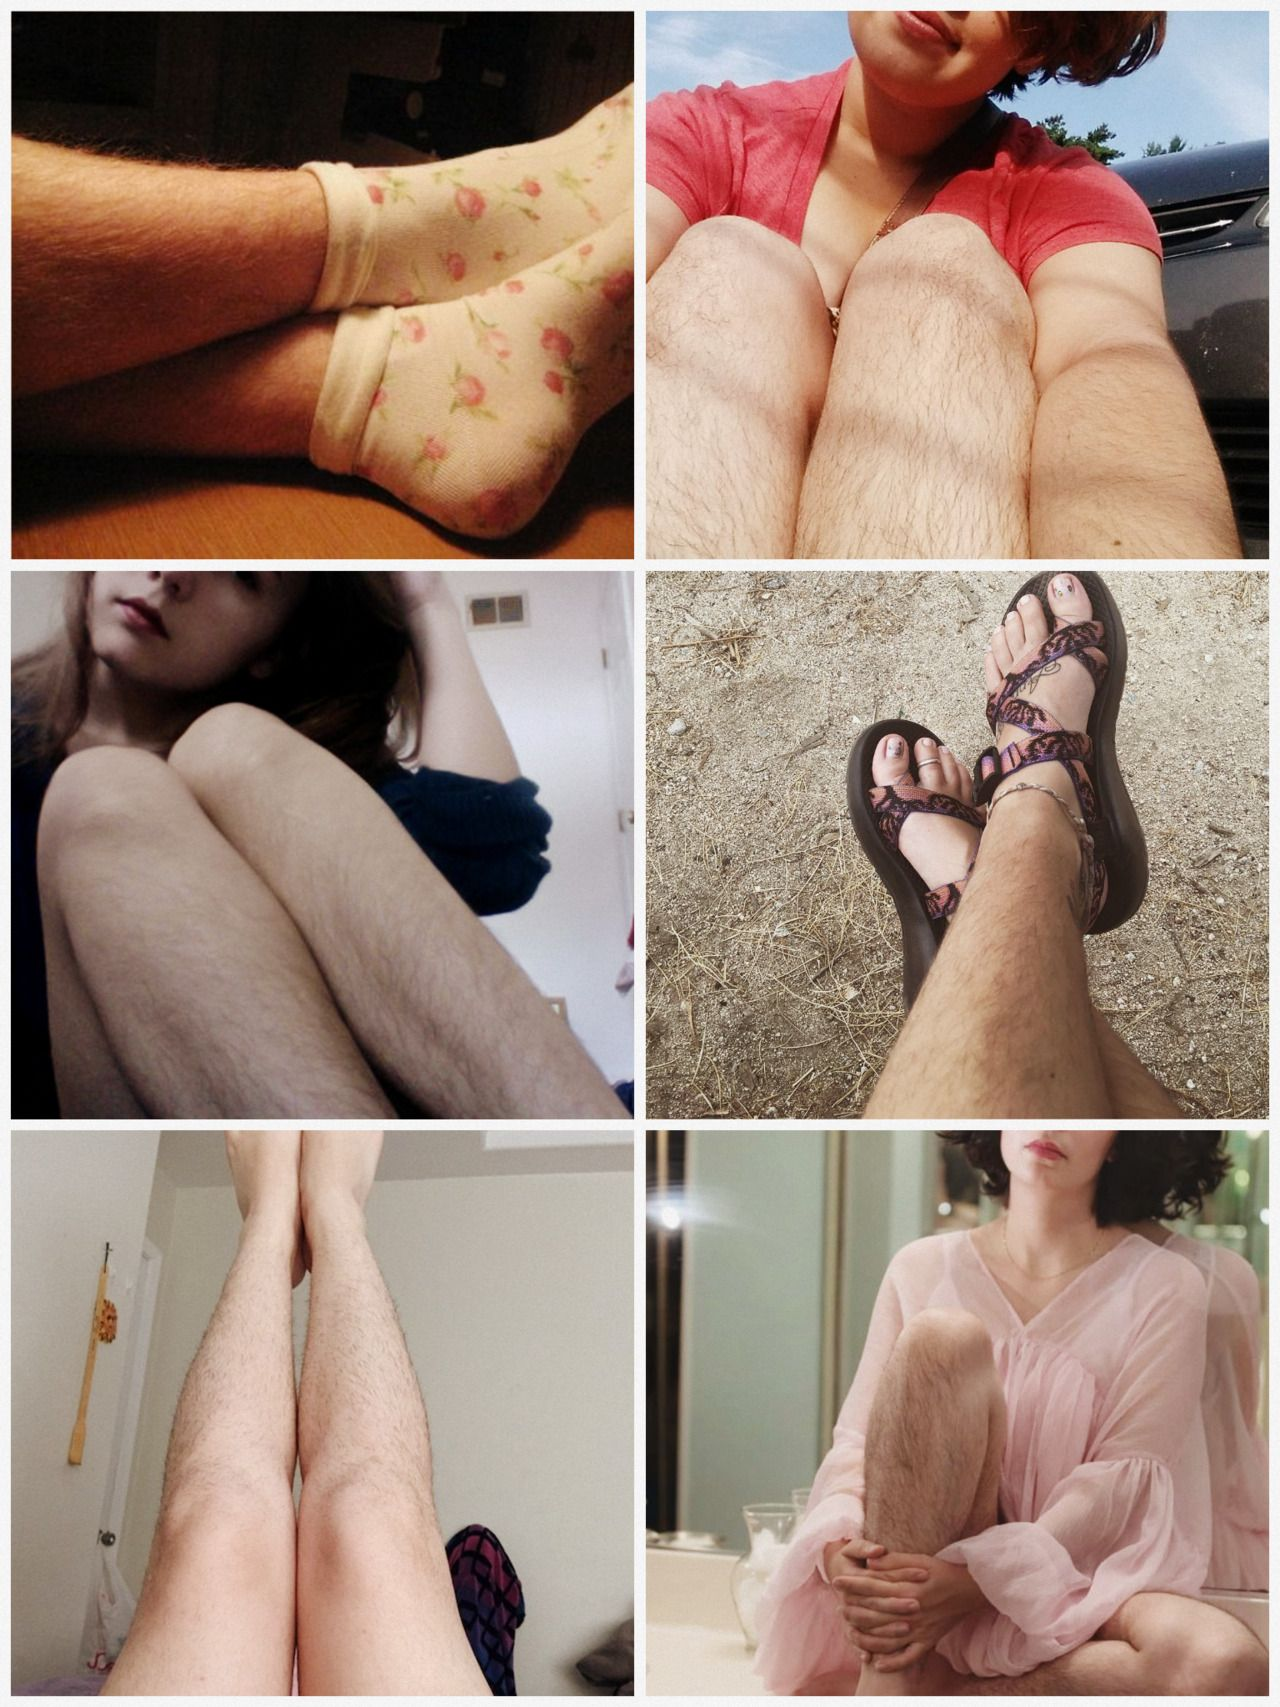 Hairy Legs Lesbians